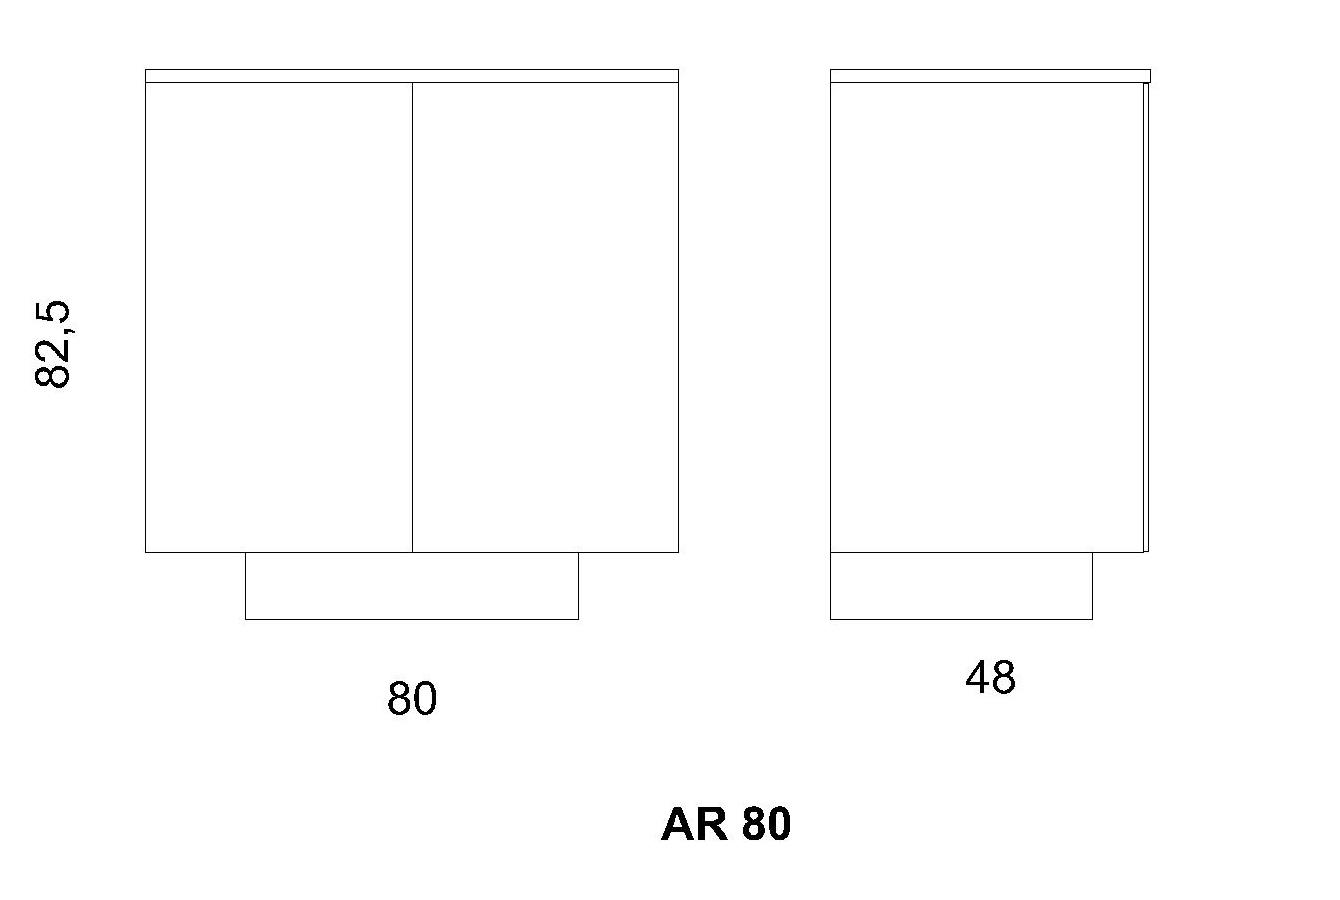 Antina AR/80